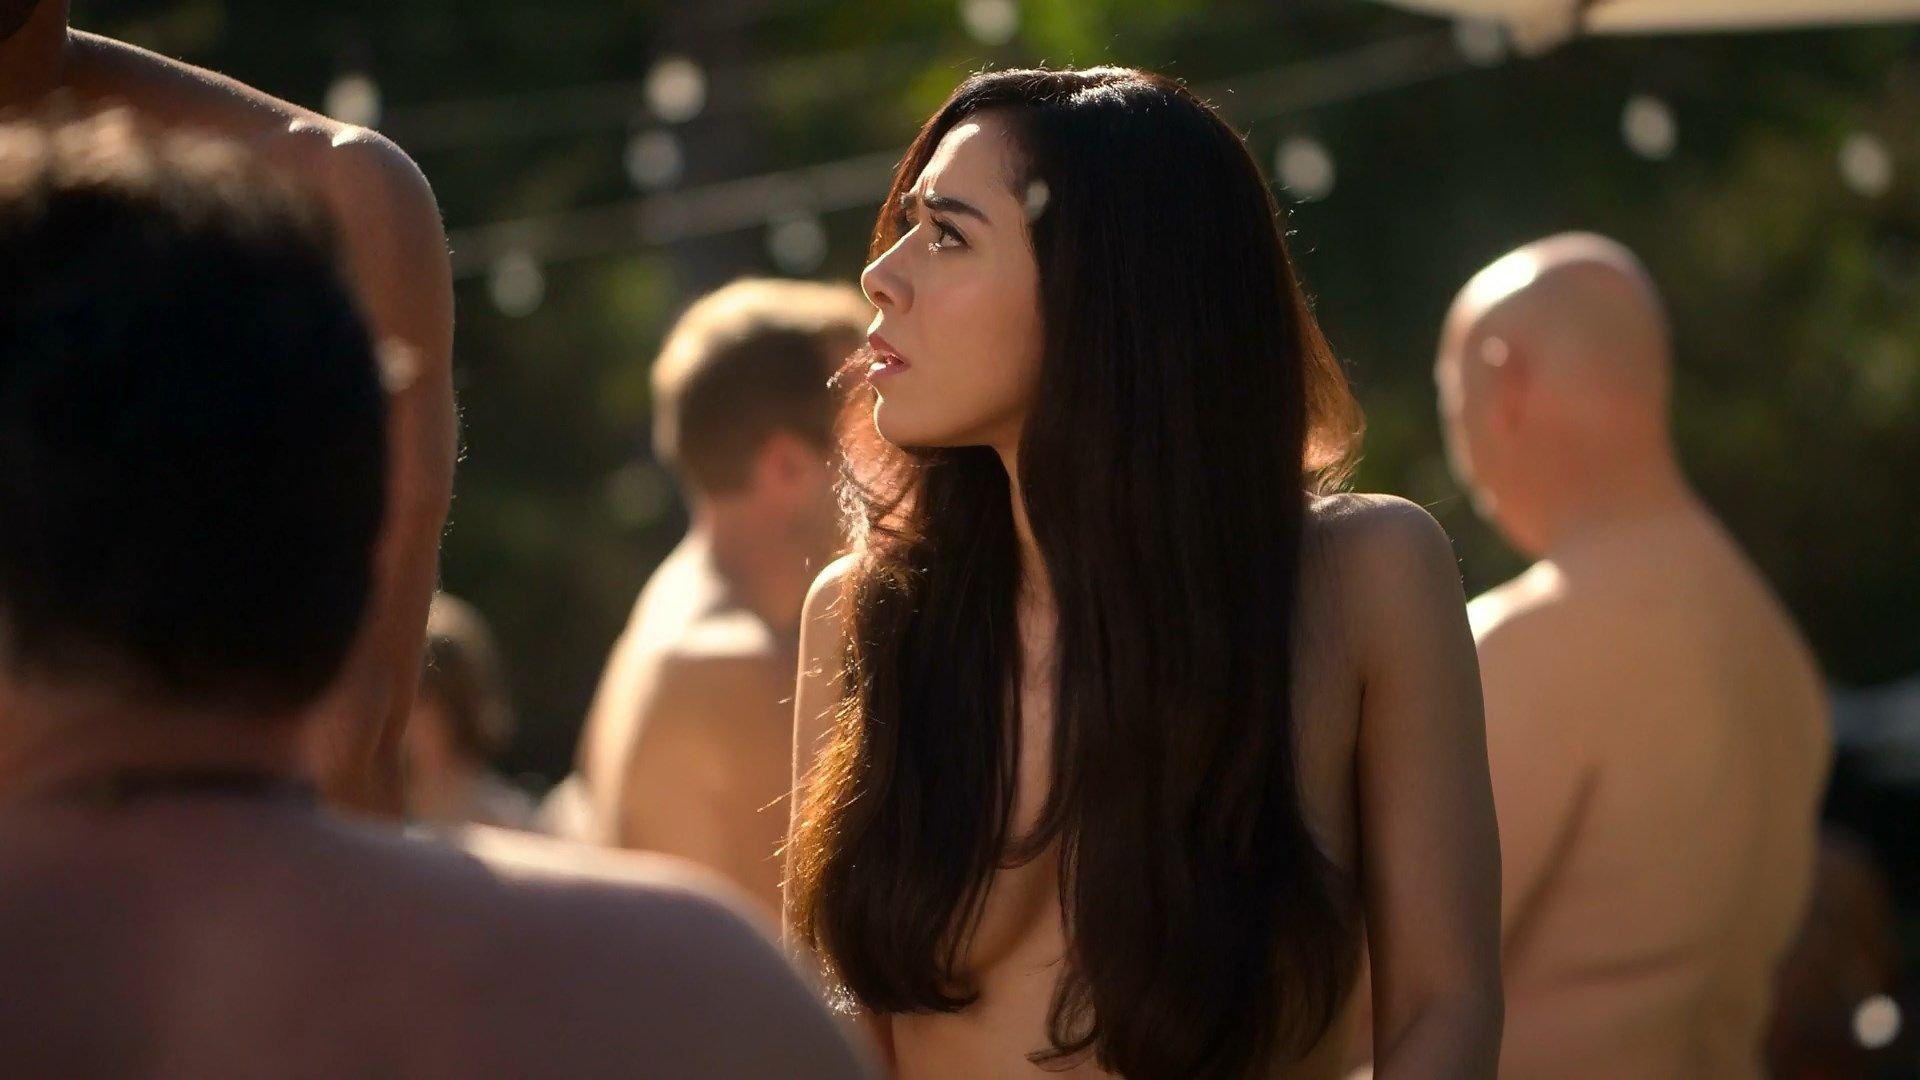 Aimee garcia naked nude